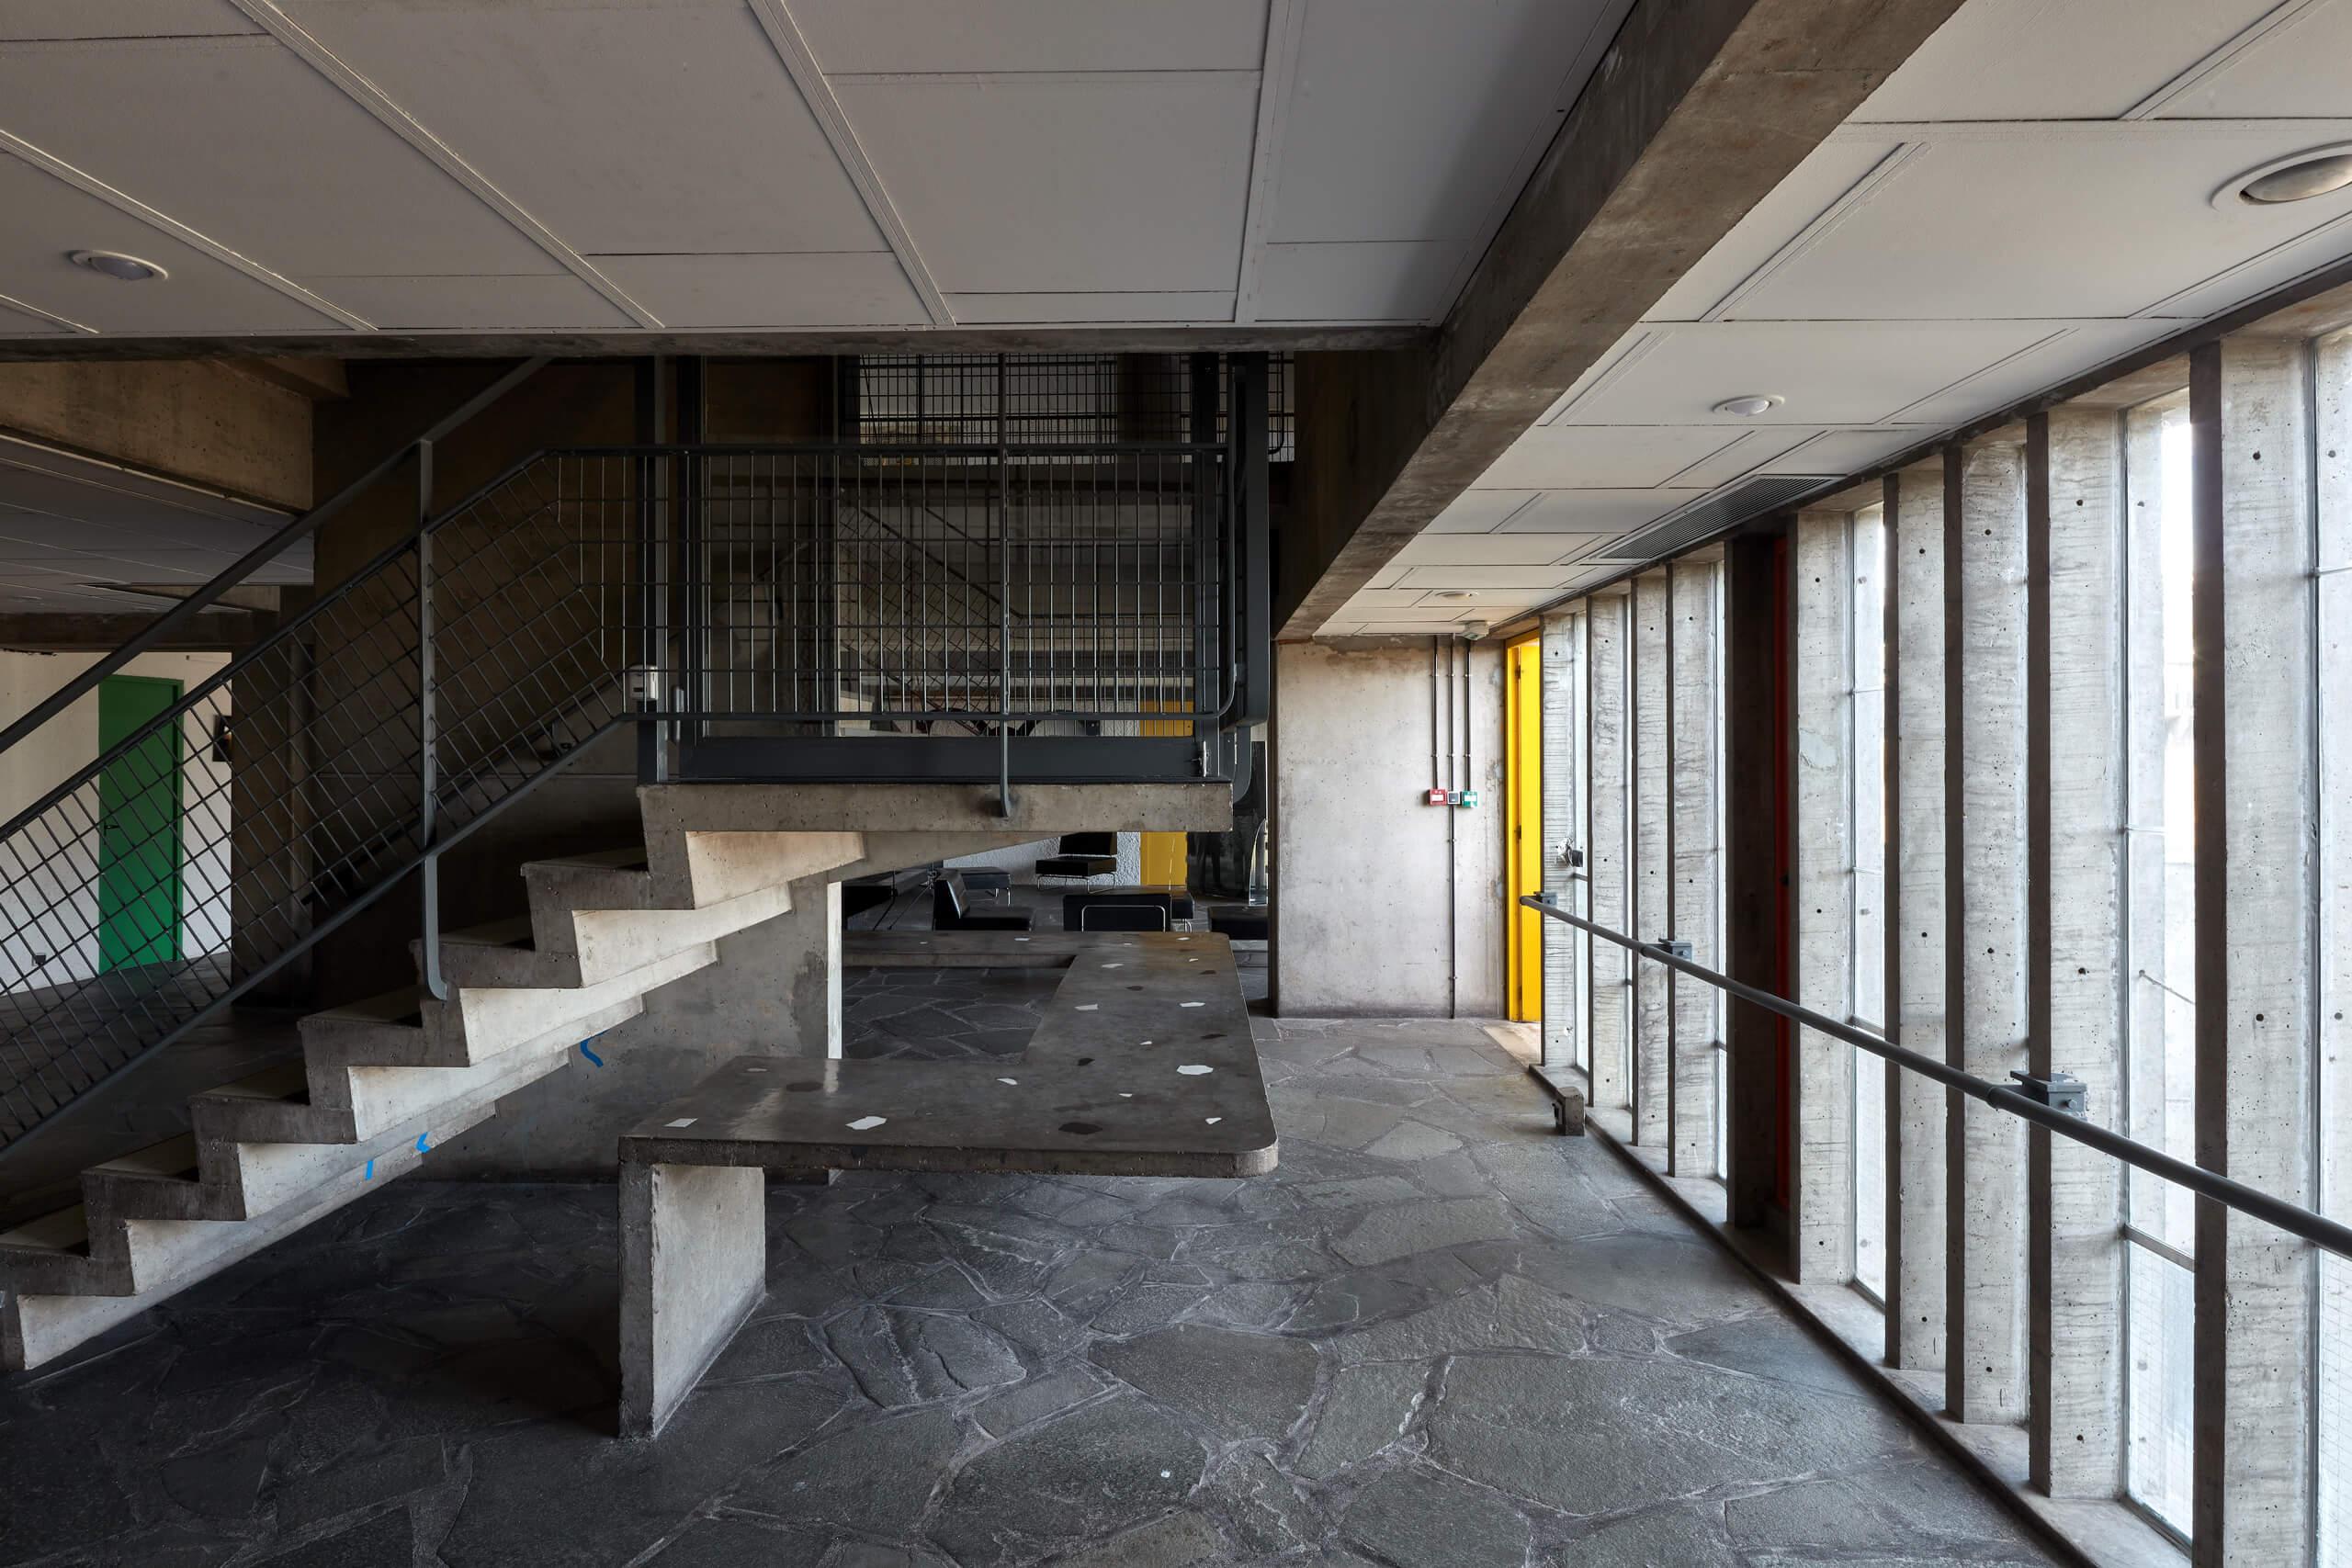 Federico_Covre_Le_Corbusier_Stadium_Firminy_2018_21